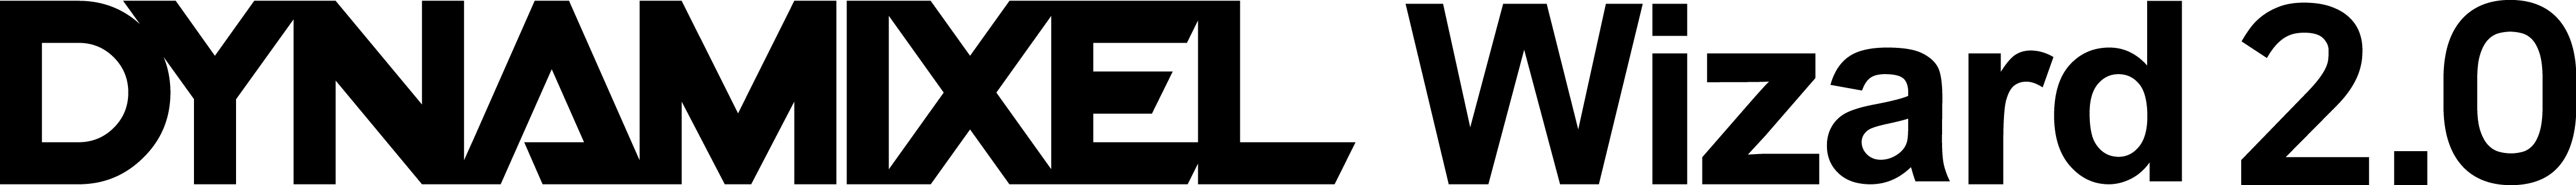 dynamixel-wizard2-logo.png